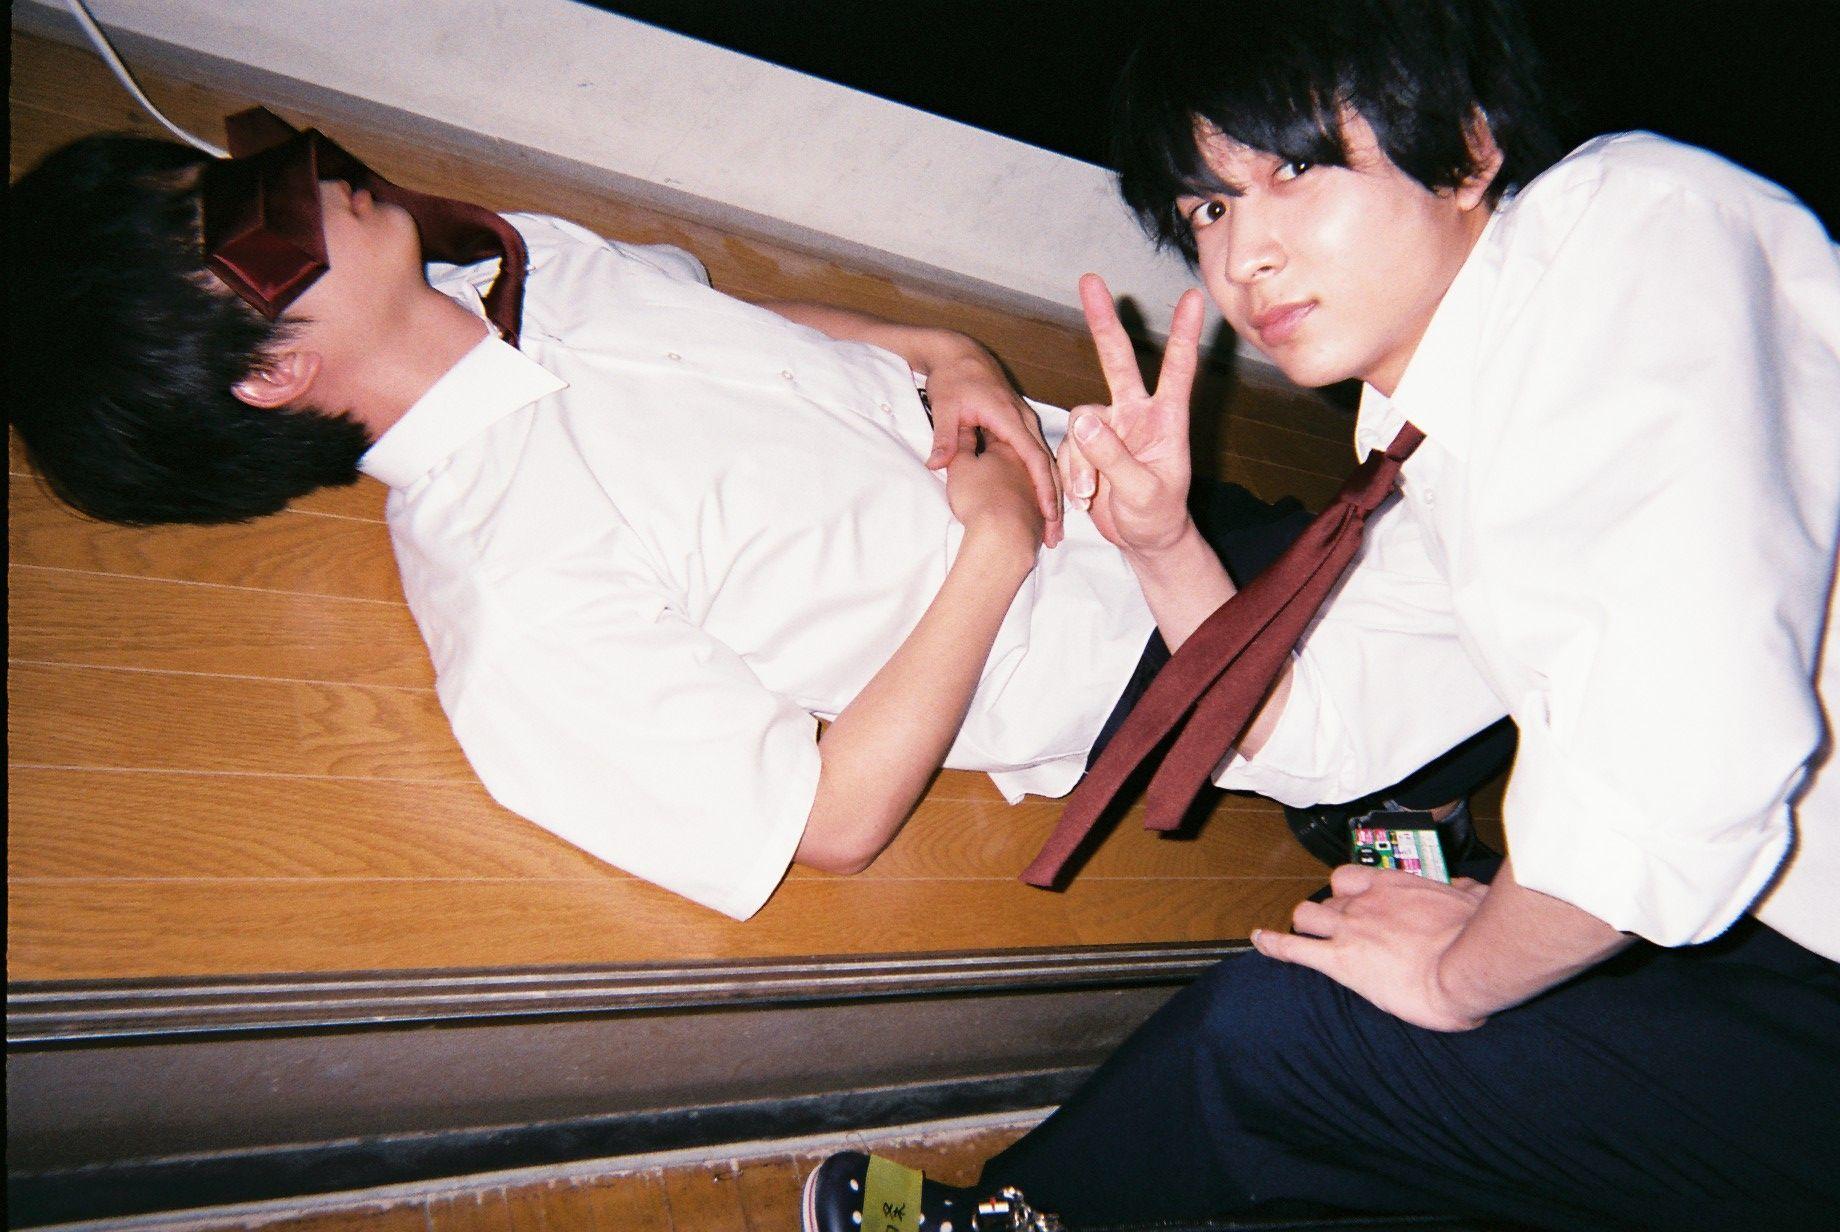 (C)2020「のぼる小寺さん」製作委員会(C)珈琲/講談社